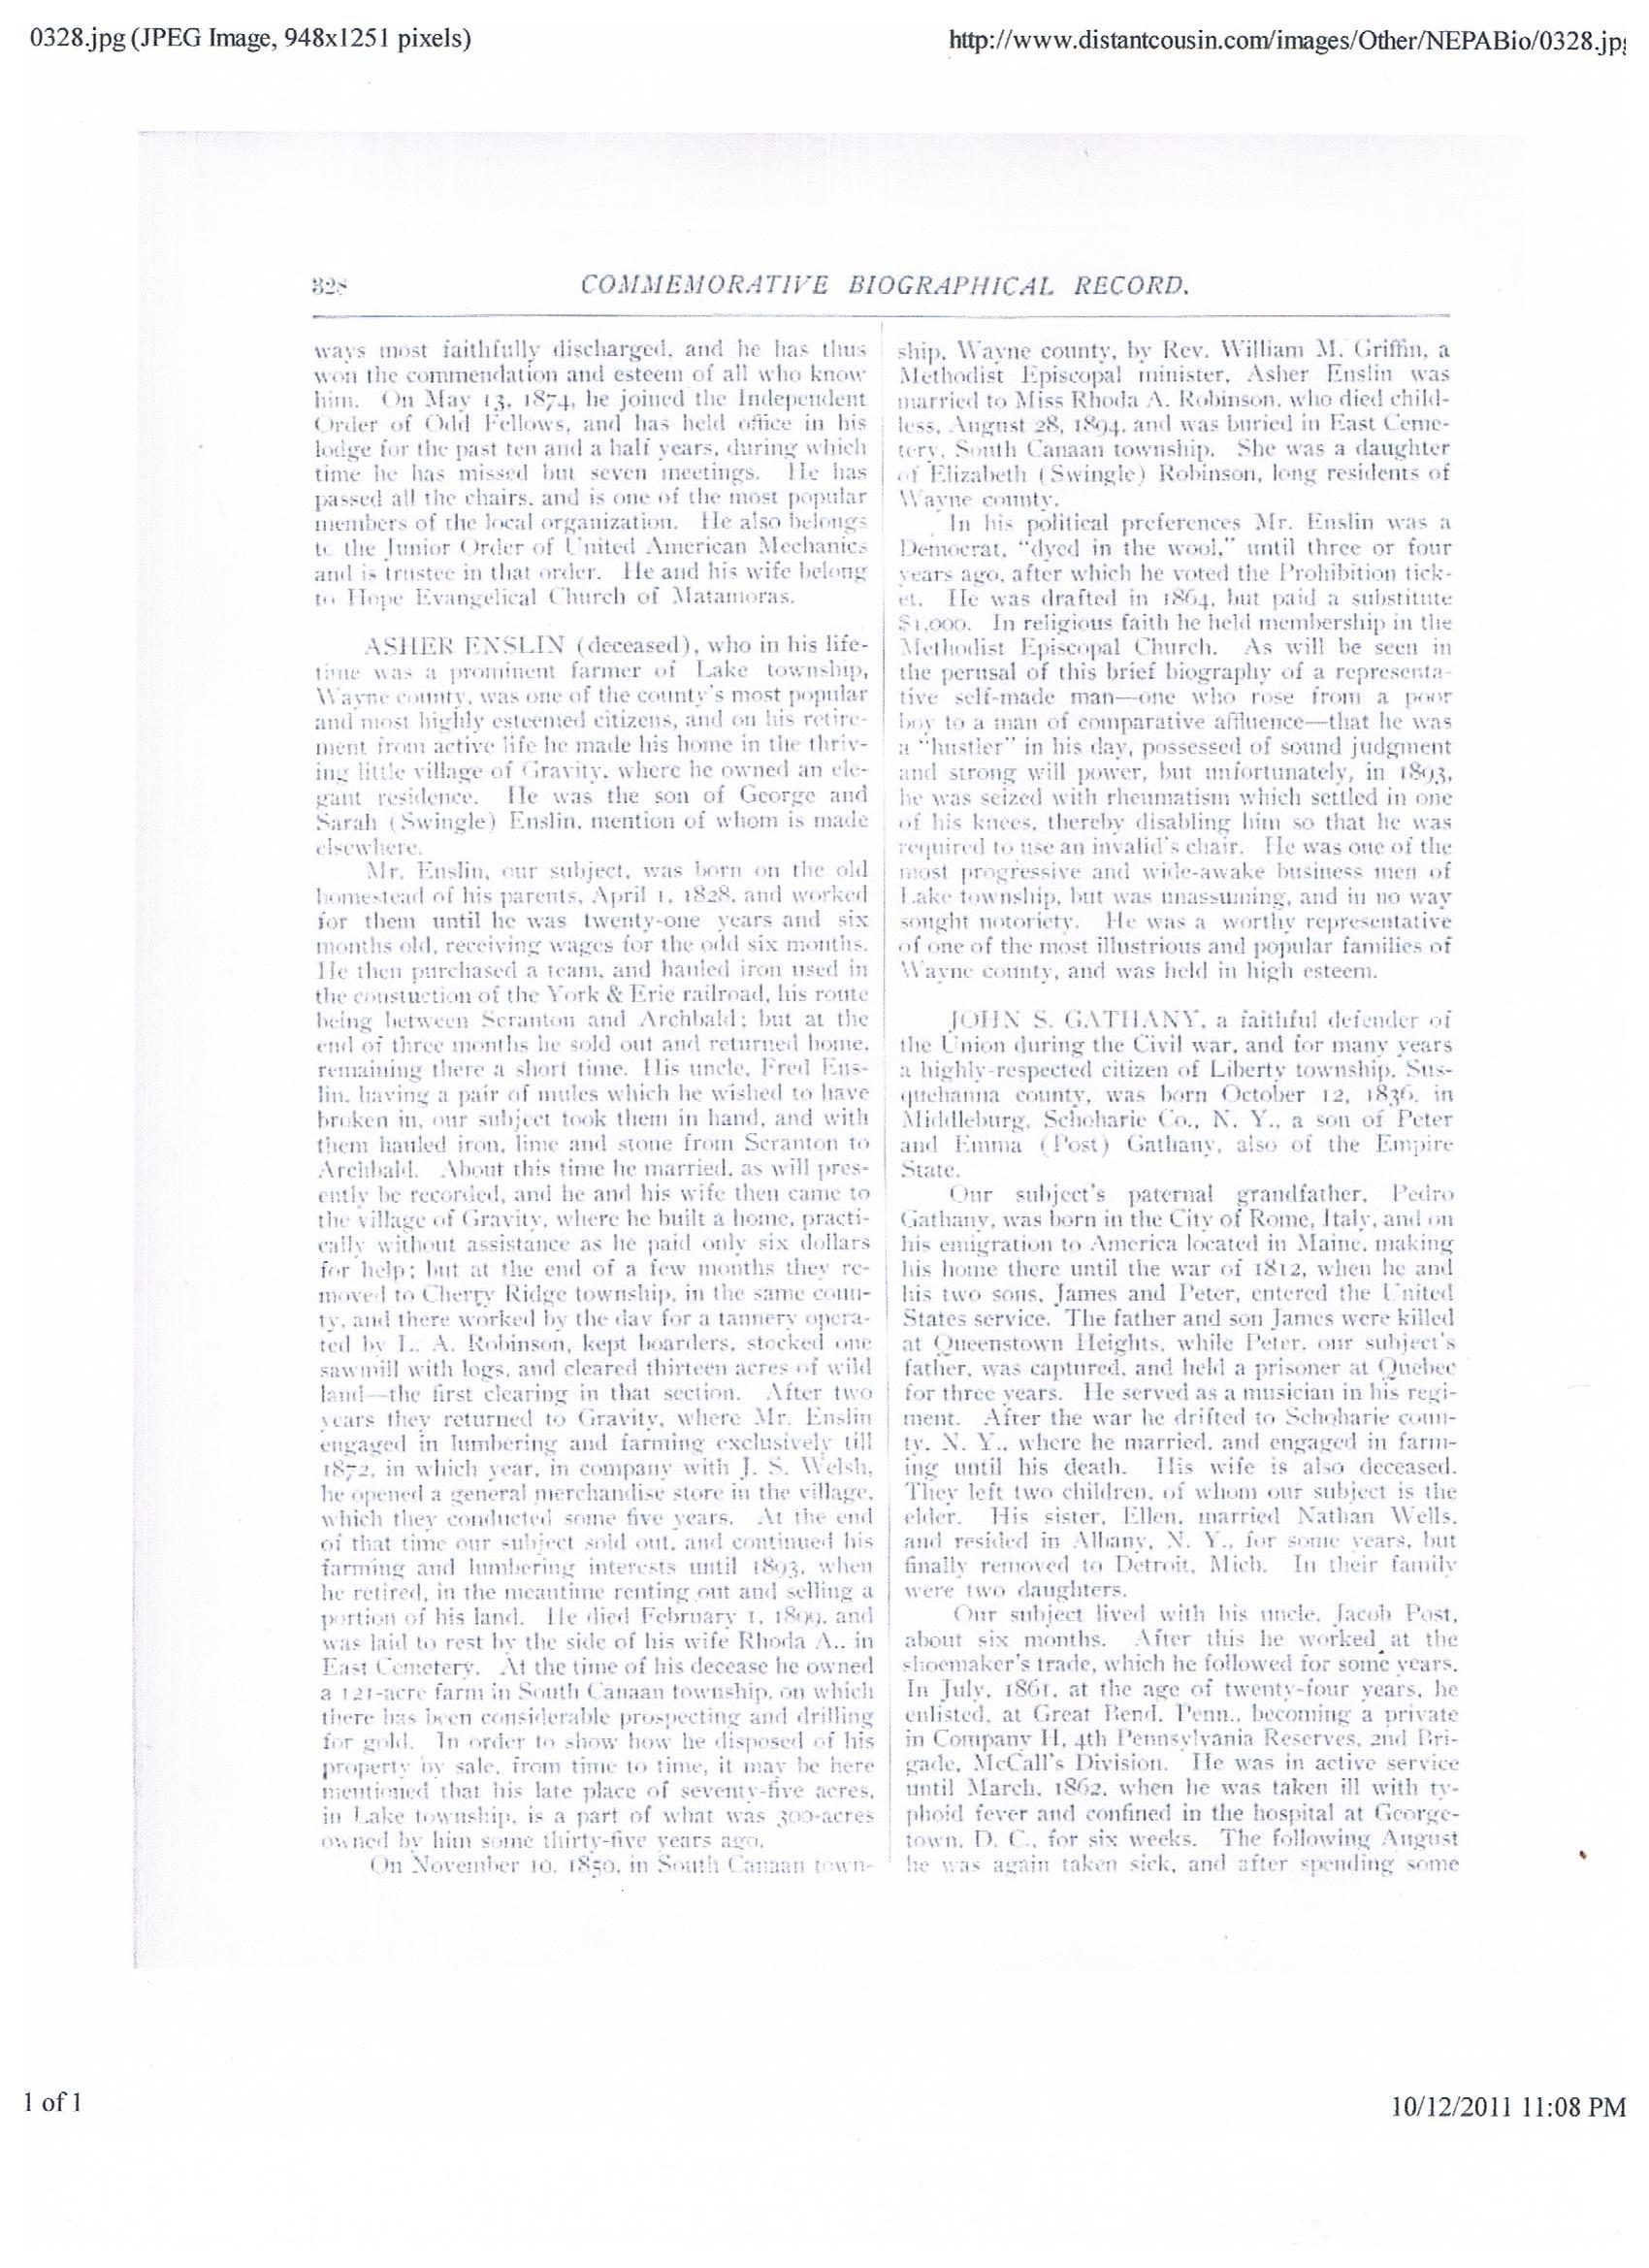 Frederick of Catherine Swingle/George Enslin